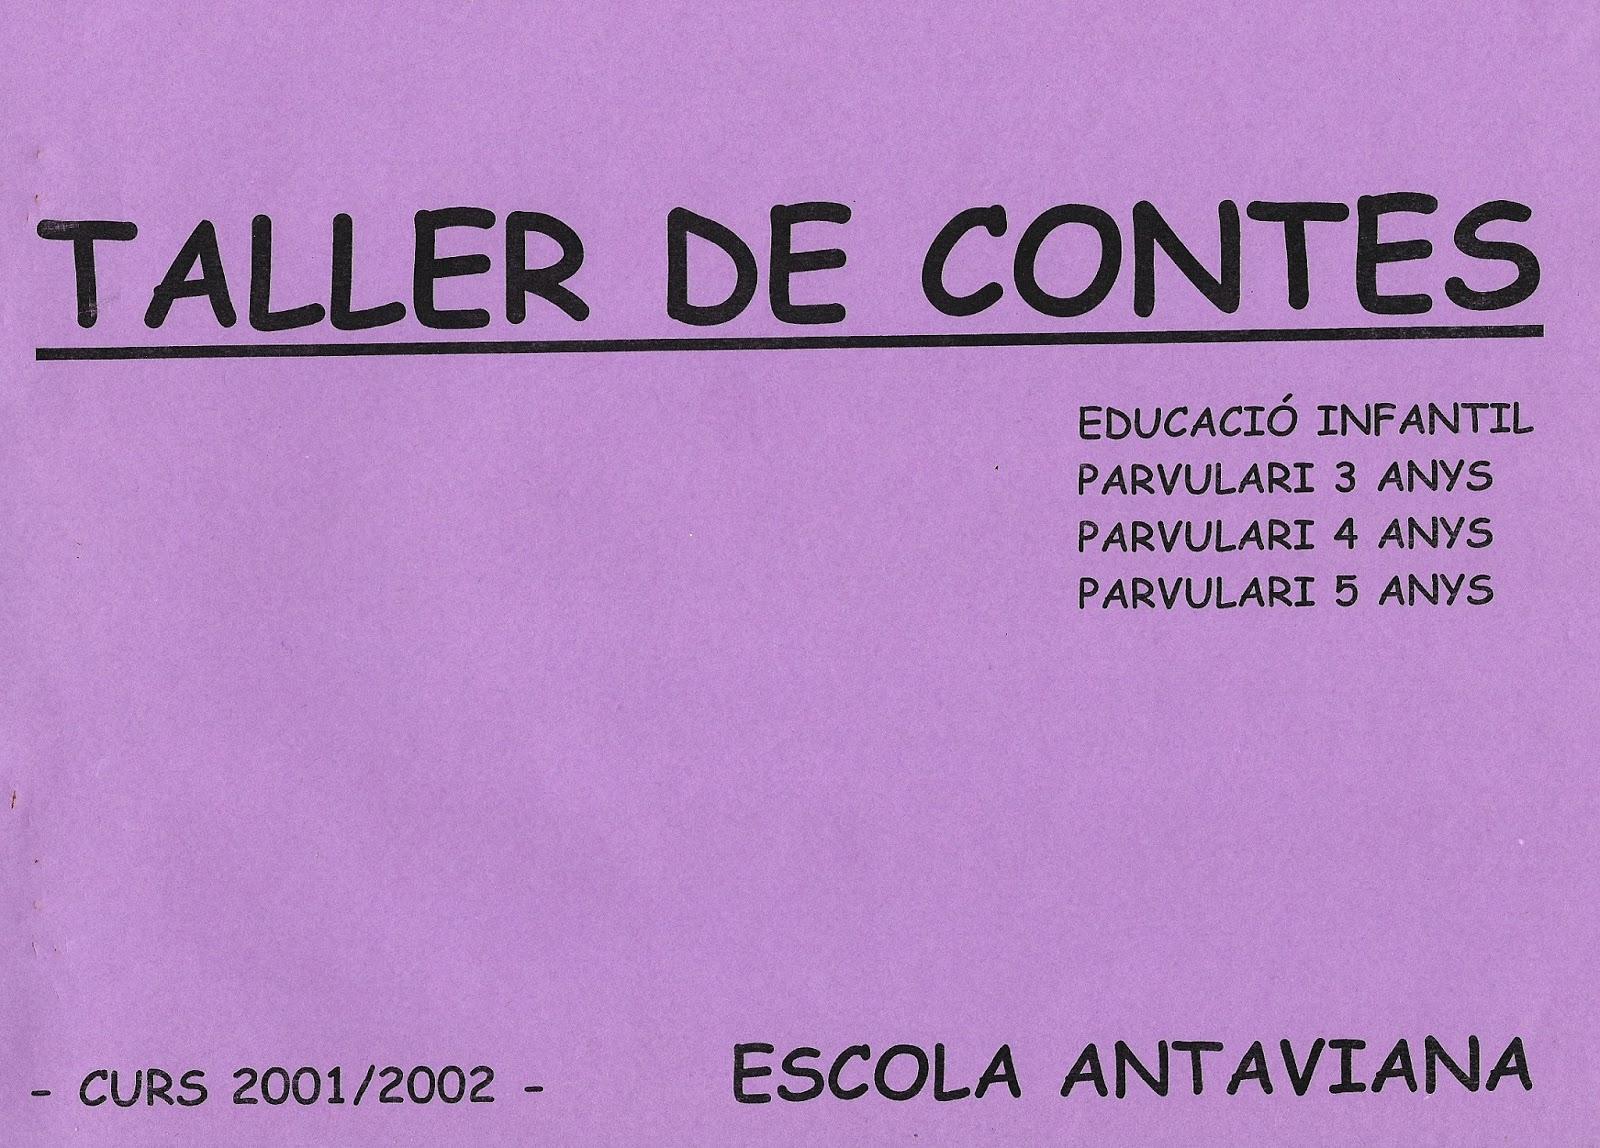 http://issuu.com/blocsdantaviana/docs/2n_taller_de_contes_ed._inf._2001-0